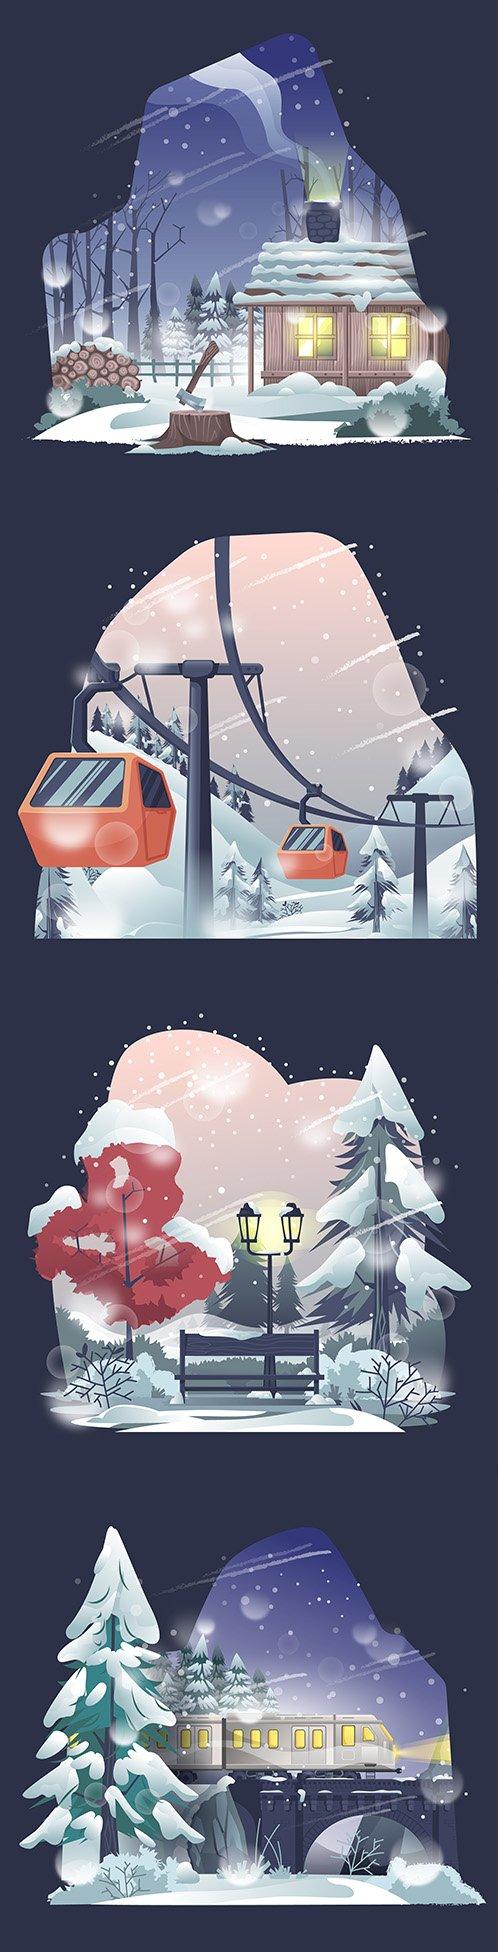 Winter Beautiful Illustration